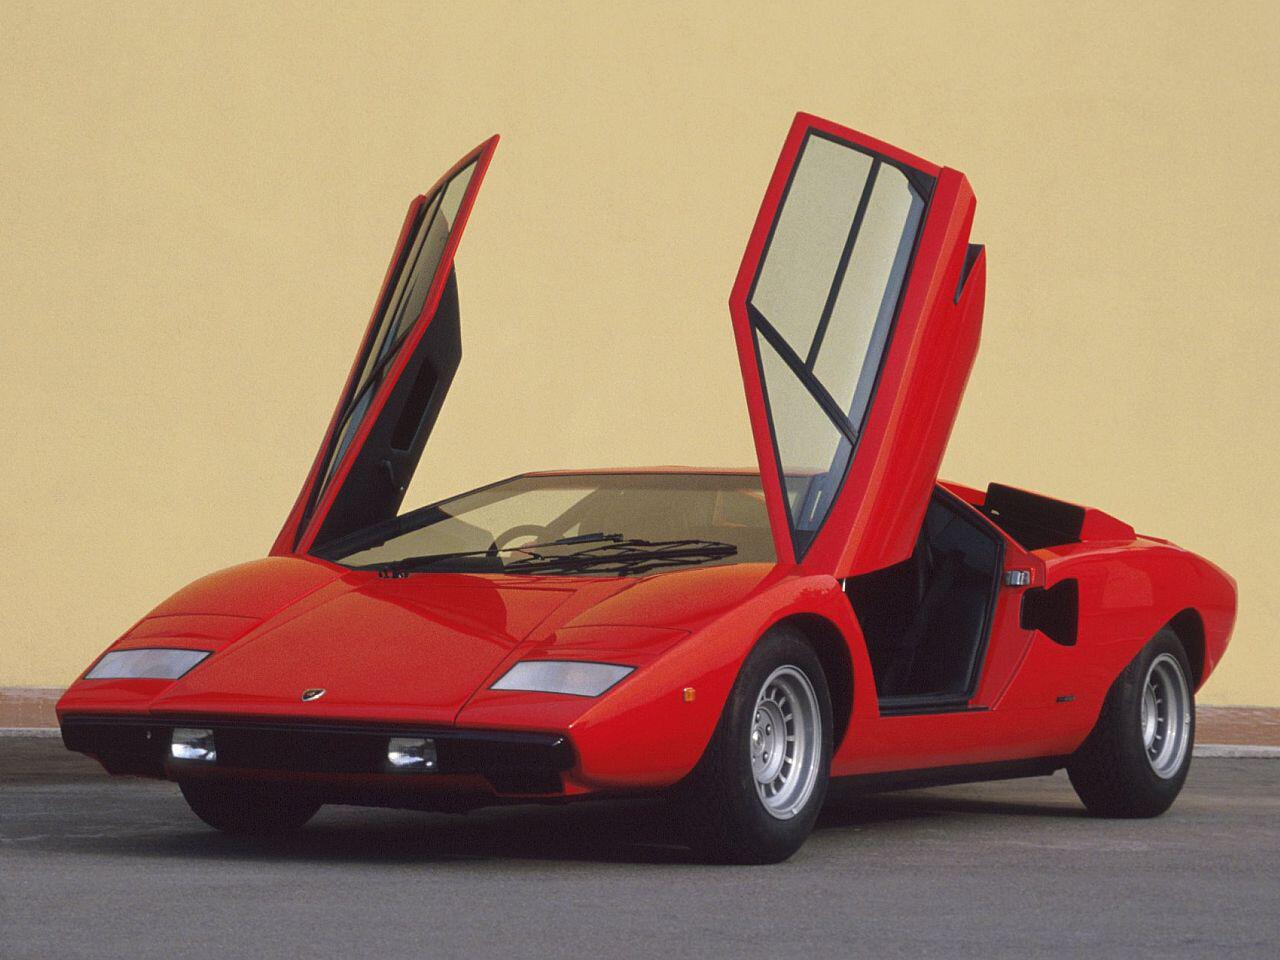 Bild zu 40-jähriges Jubiläum: Der revolutionäre Italo-Sportler Lamborghini Countach